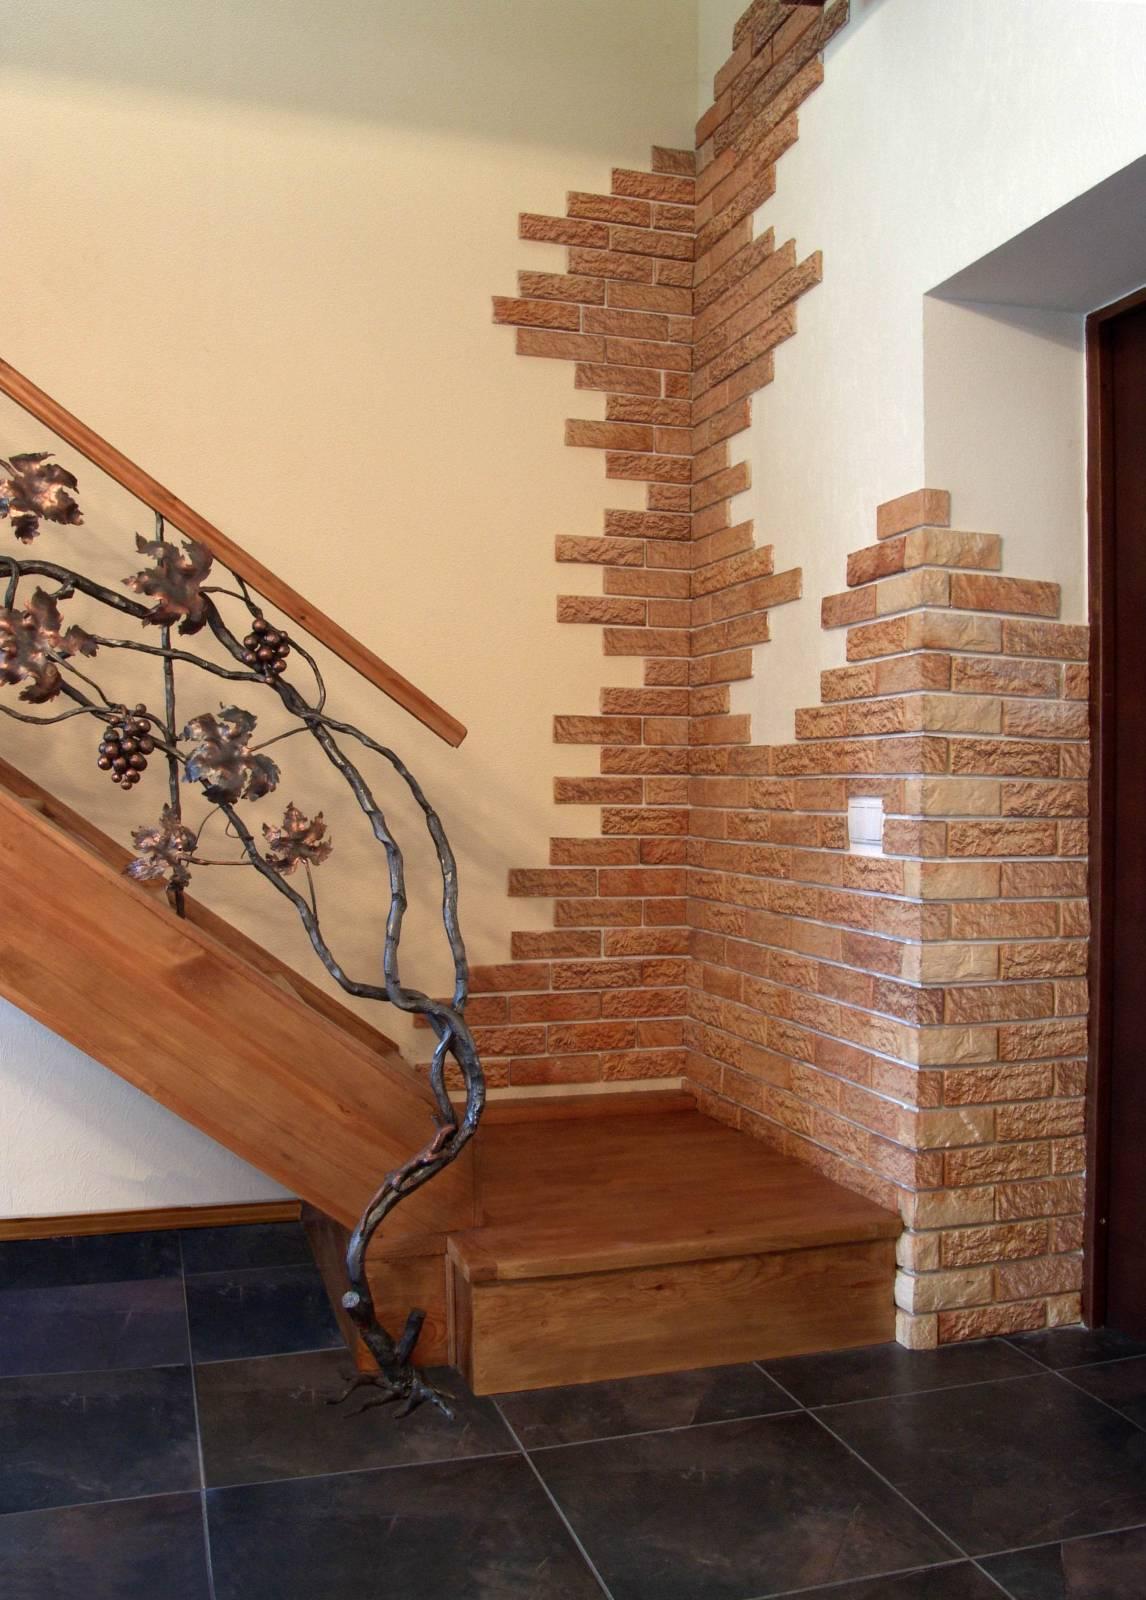 отделка коридора декоративным камнем фото. отделка коридора декоративным камнем фото.